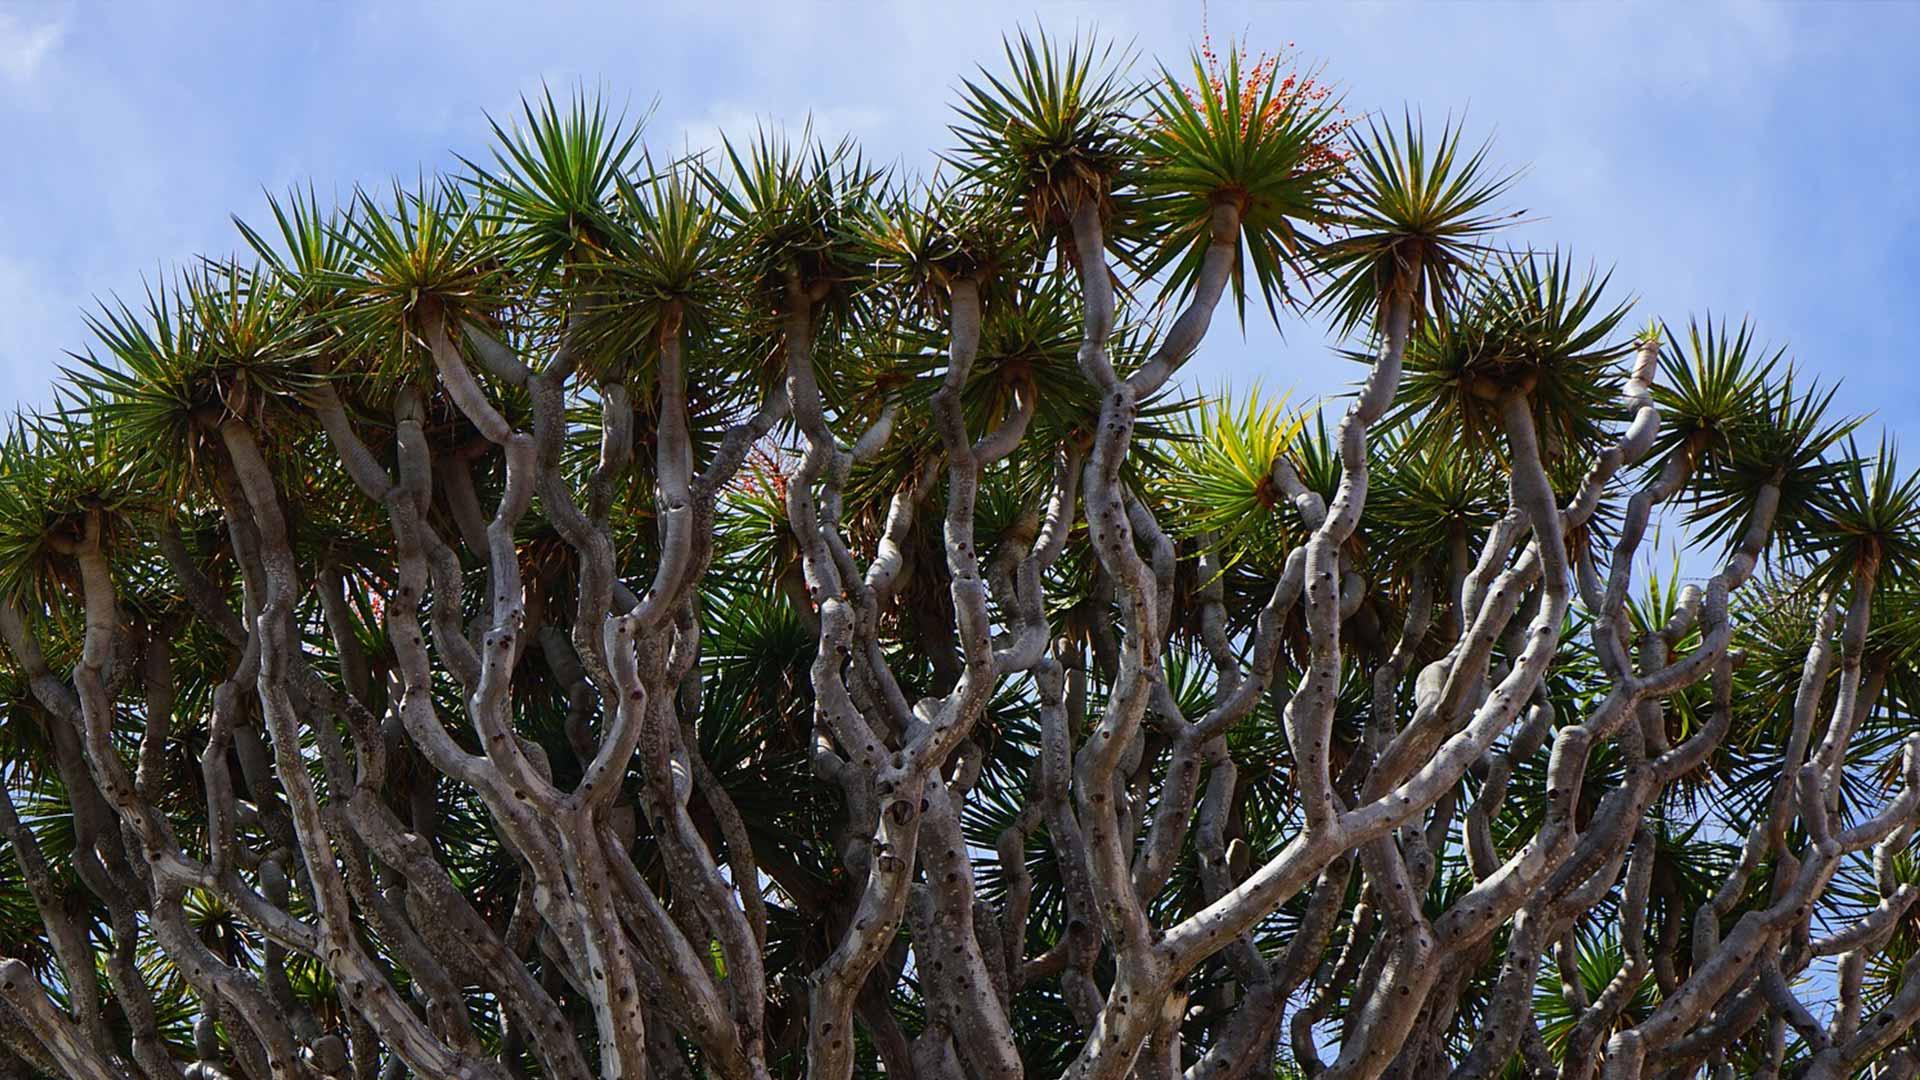 drachenbaum pflanzen pflegen desmondo